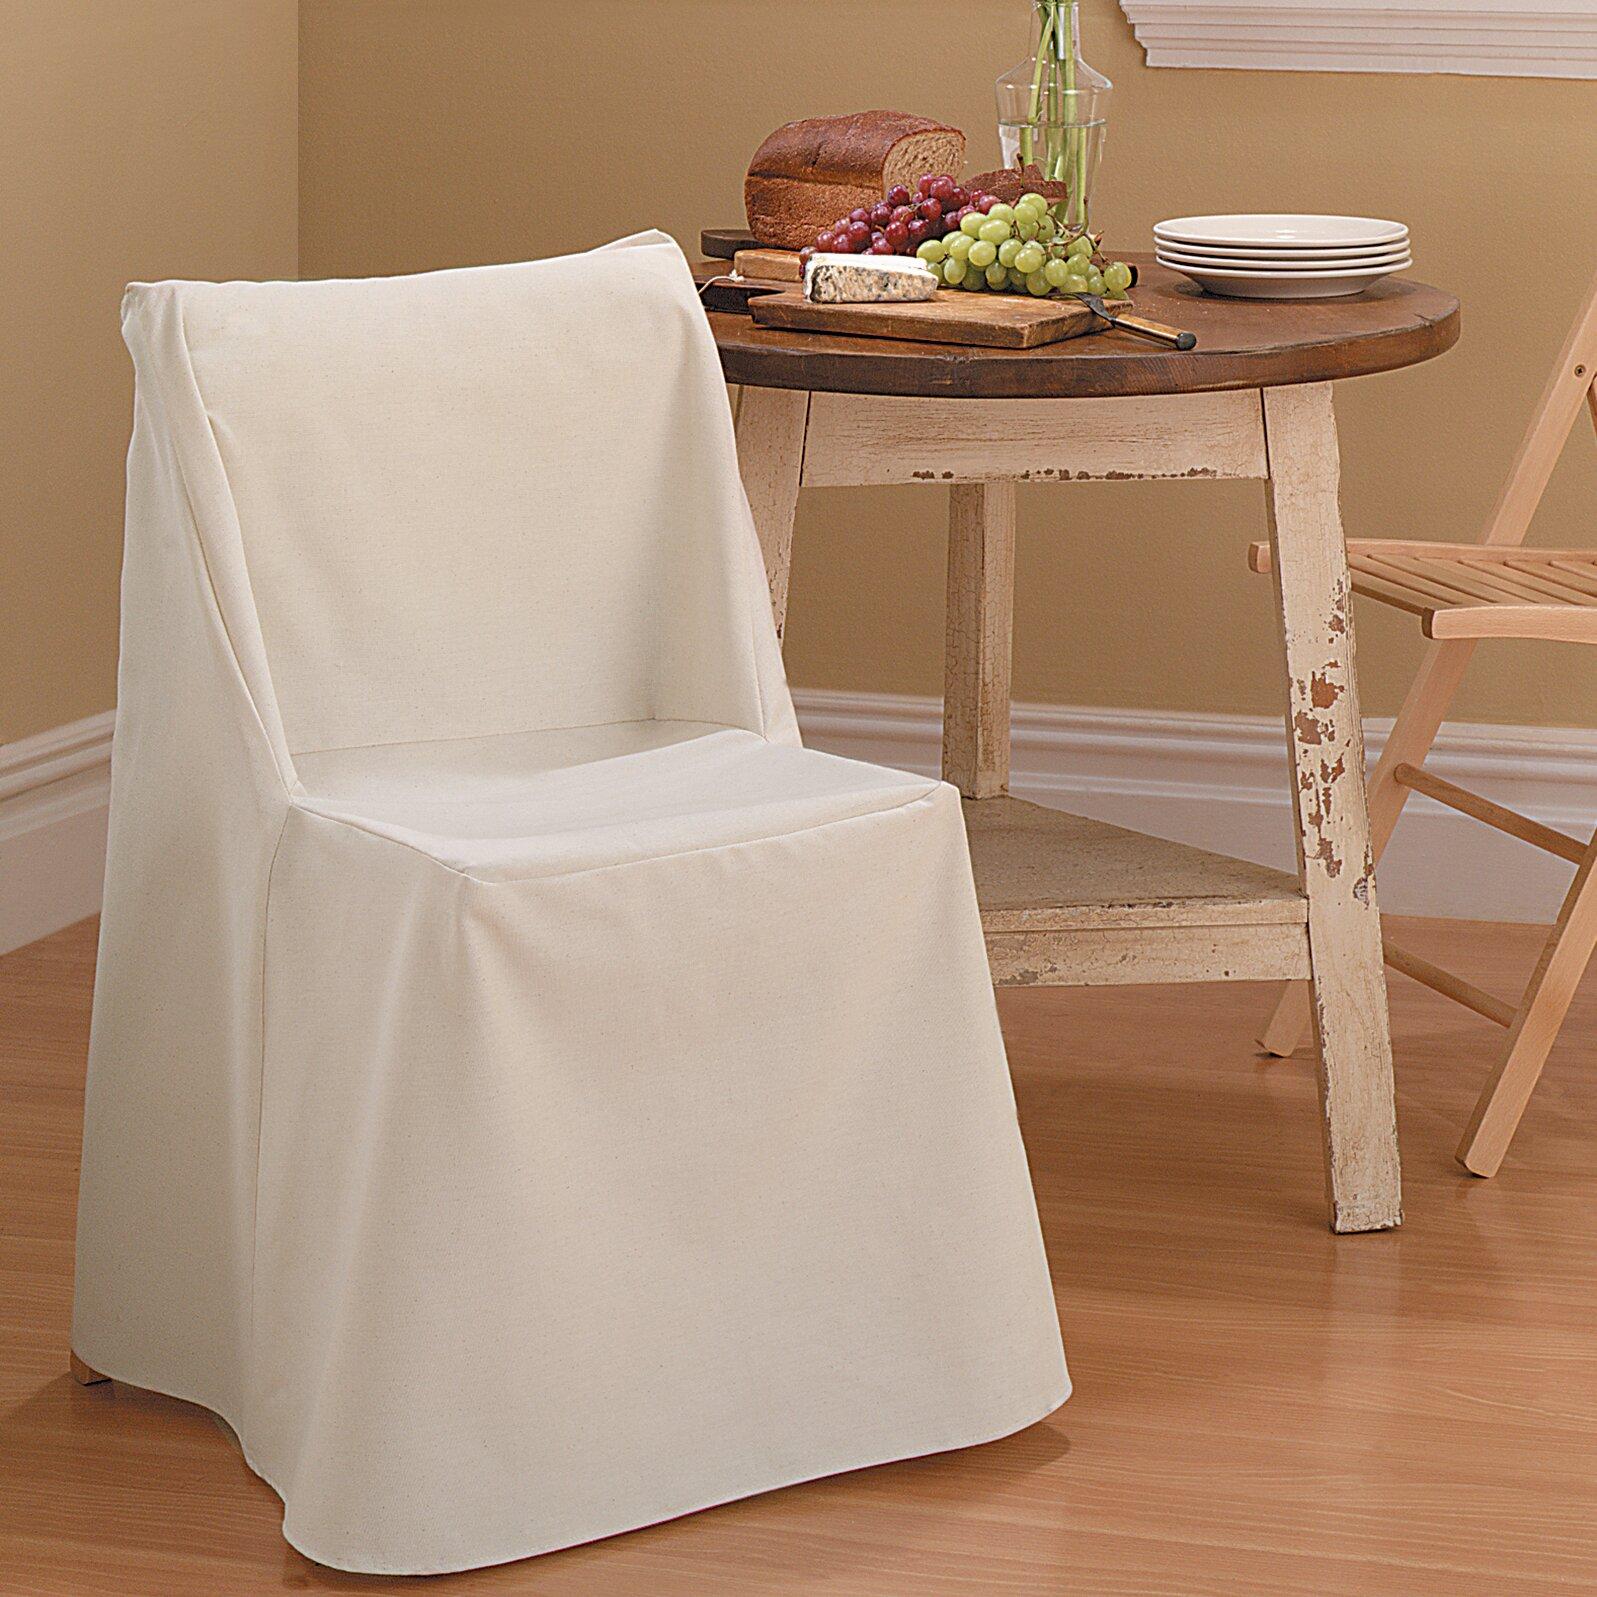 Sure Fit Cotton Duck Folding Chair Slipcover & Reviews